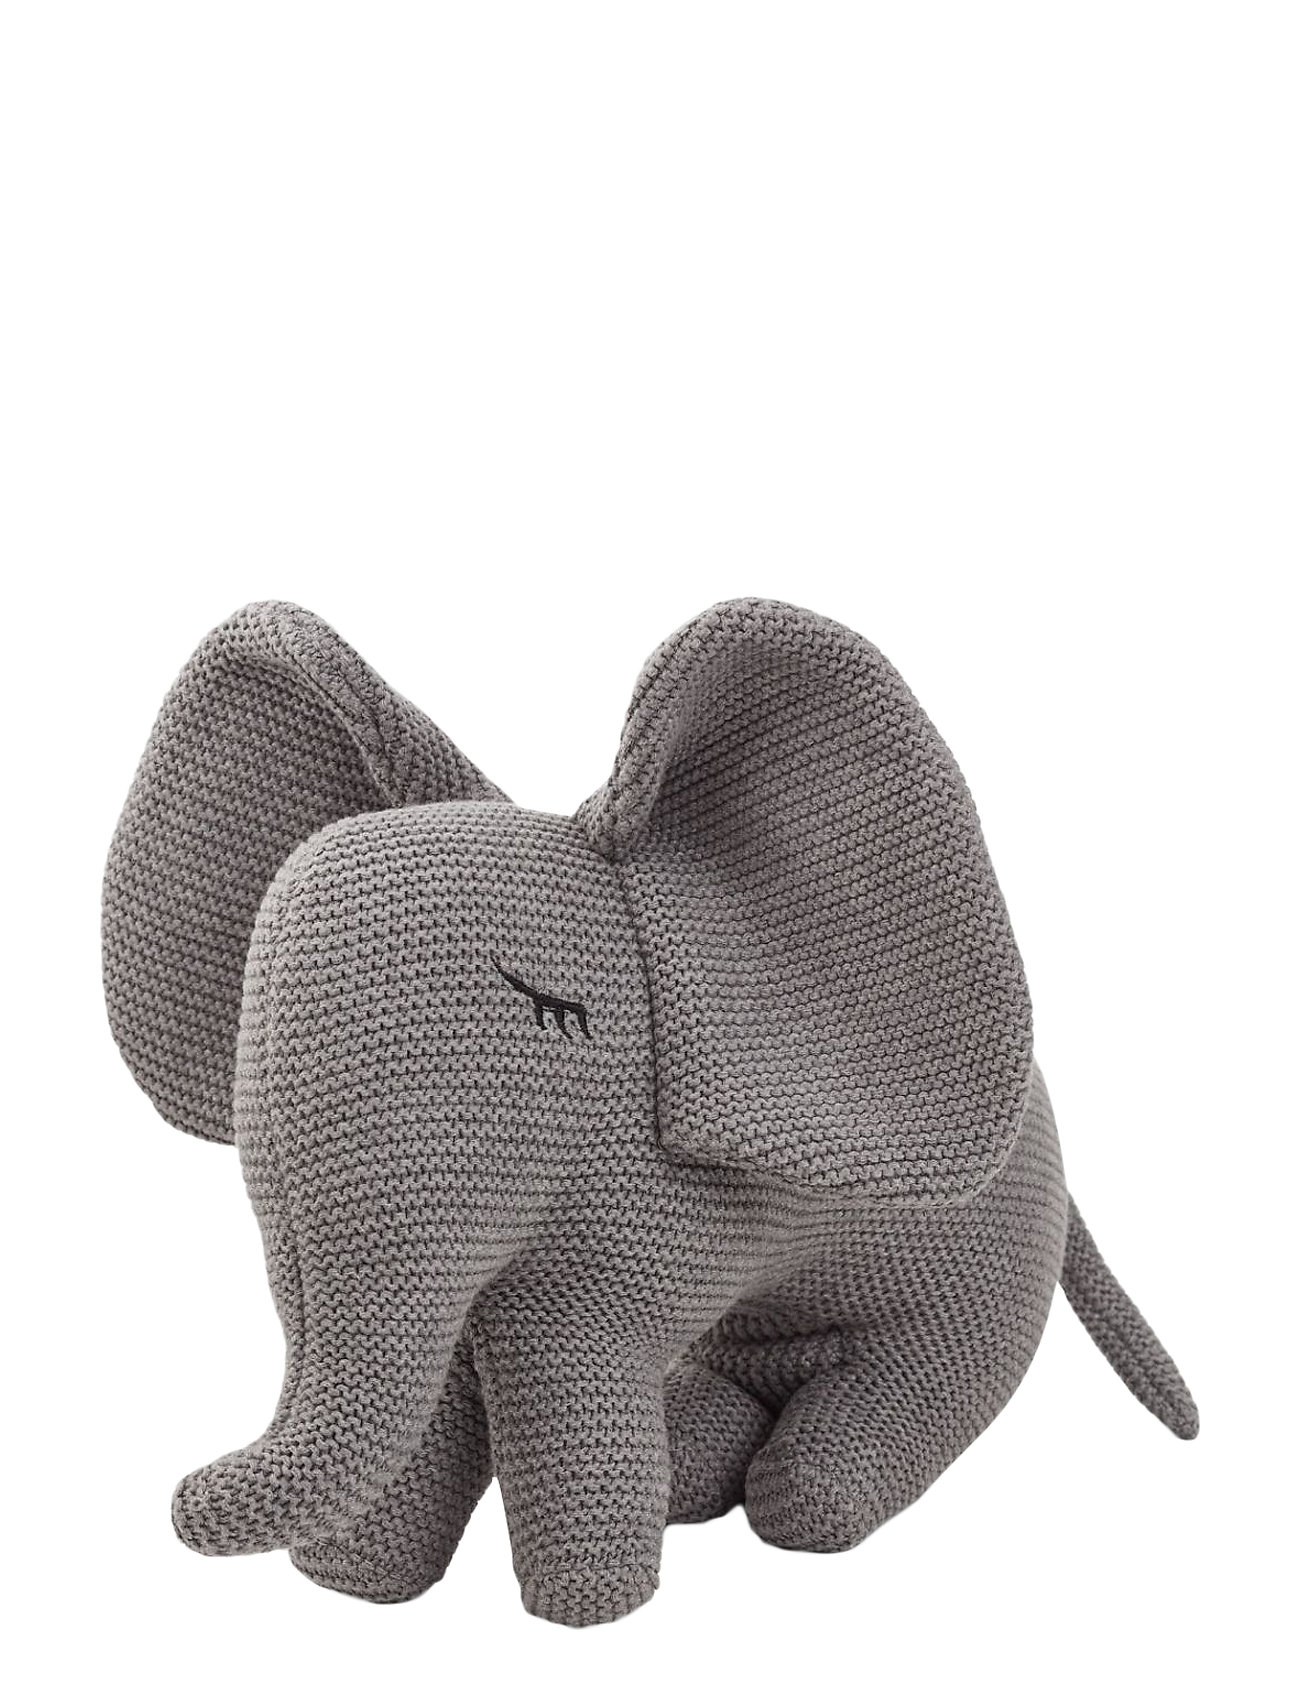 Liewood Dextor knit teddy - ELEPHANT GREY MELANGE